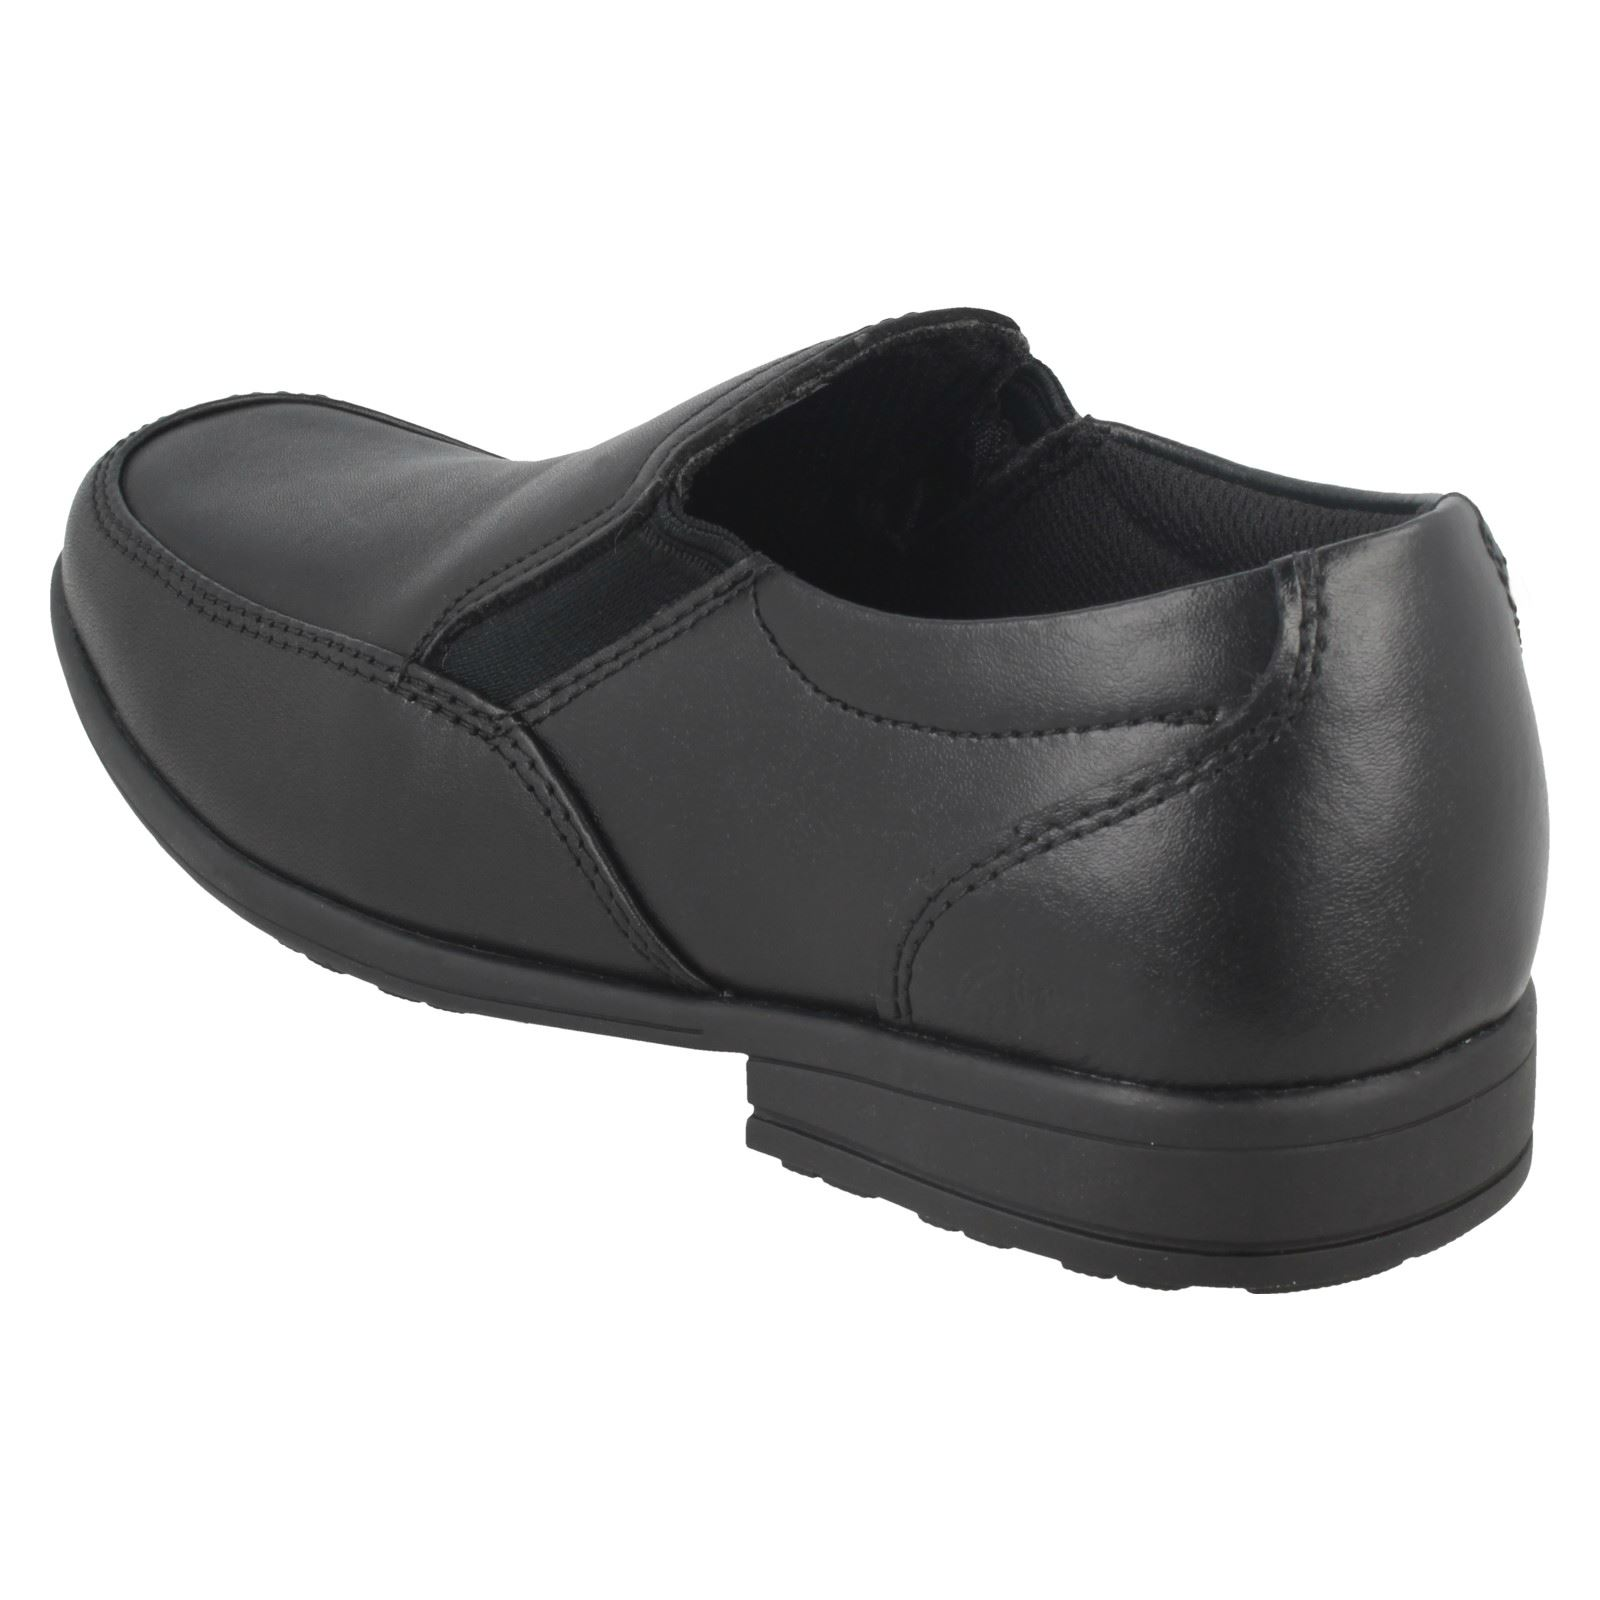 Boys Clarks Loafer Style School Shoes Kooru Step